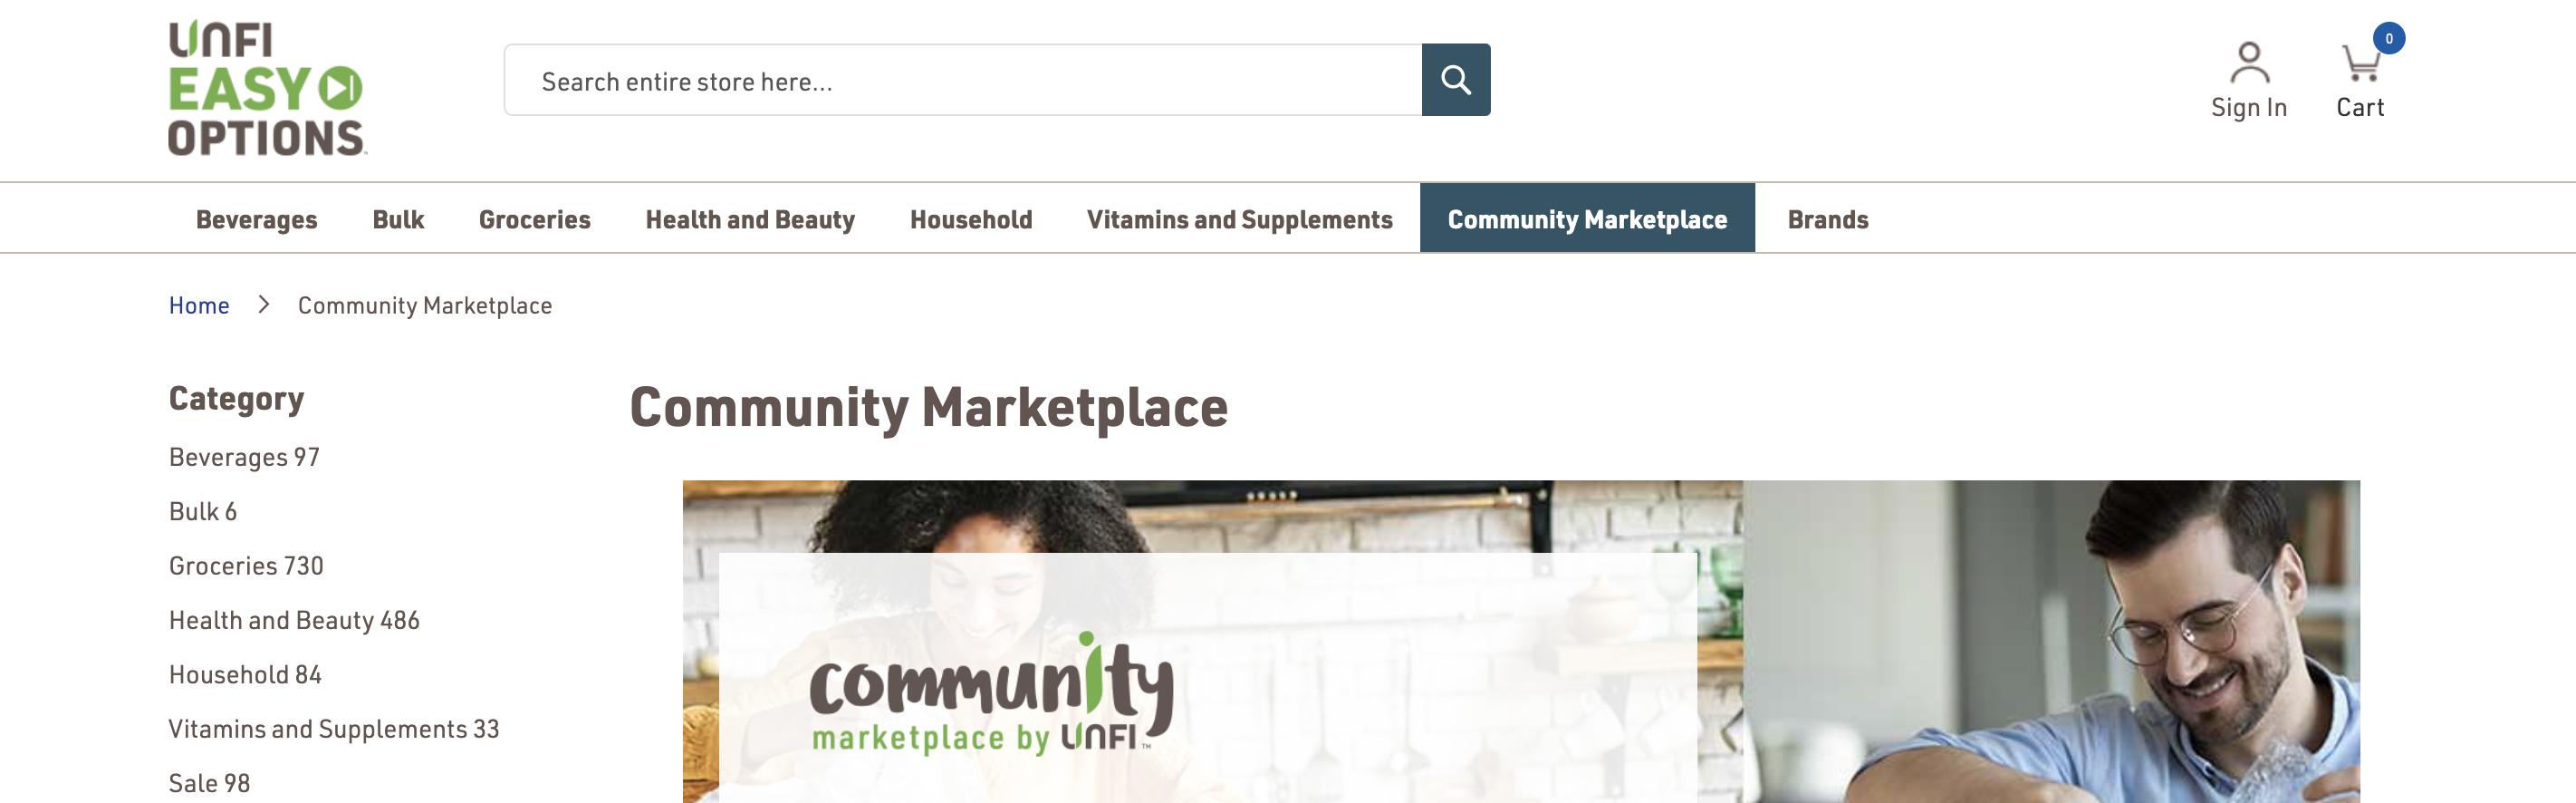 UNFI Community Marketplace